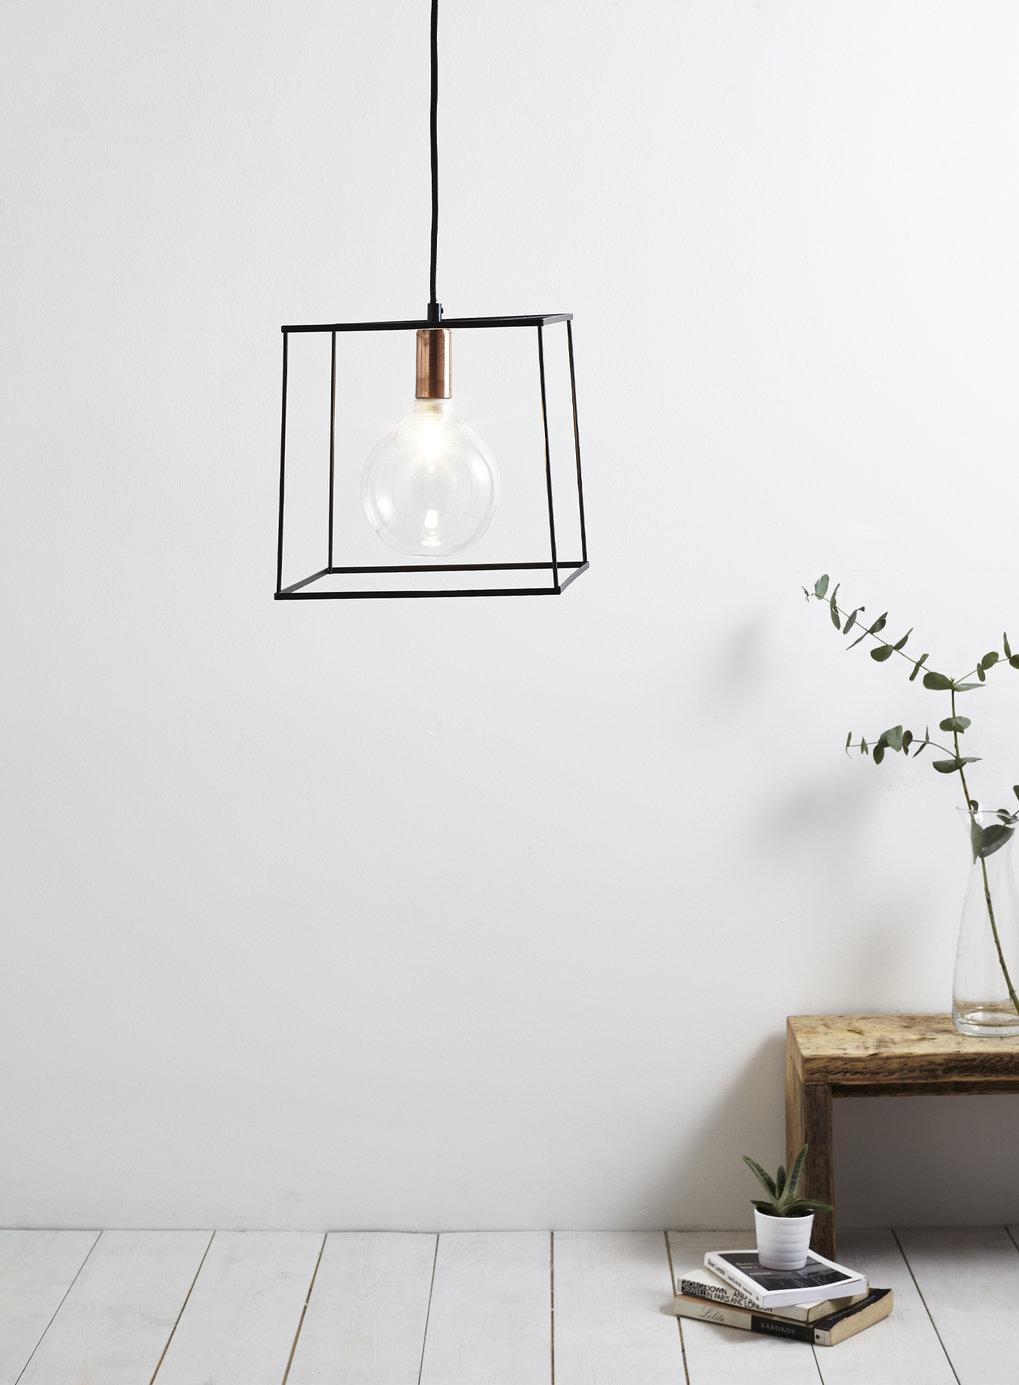 bhs ceiling light photo - 5